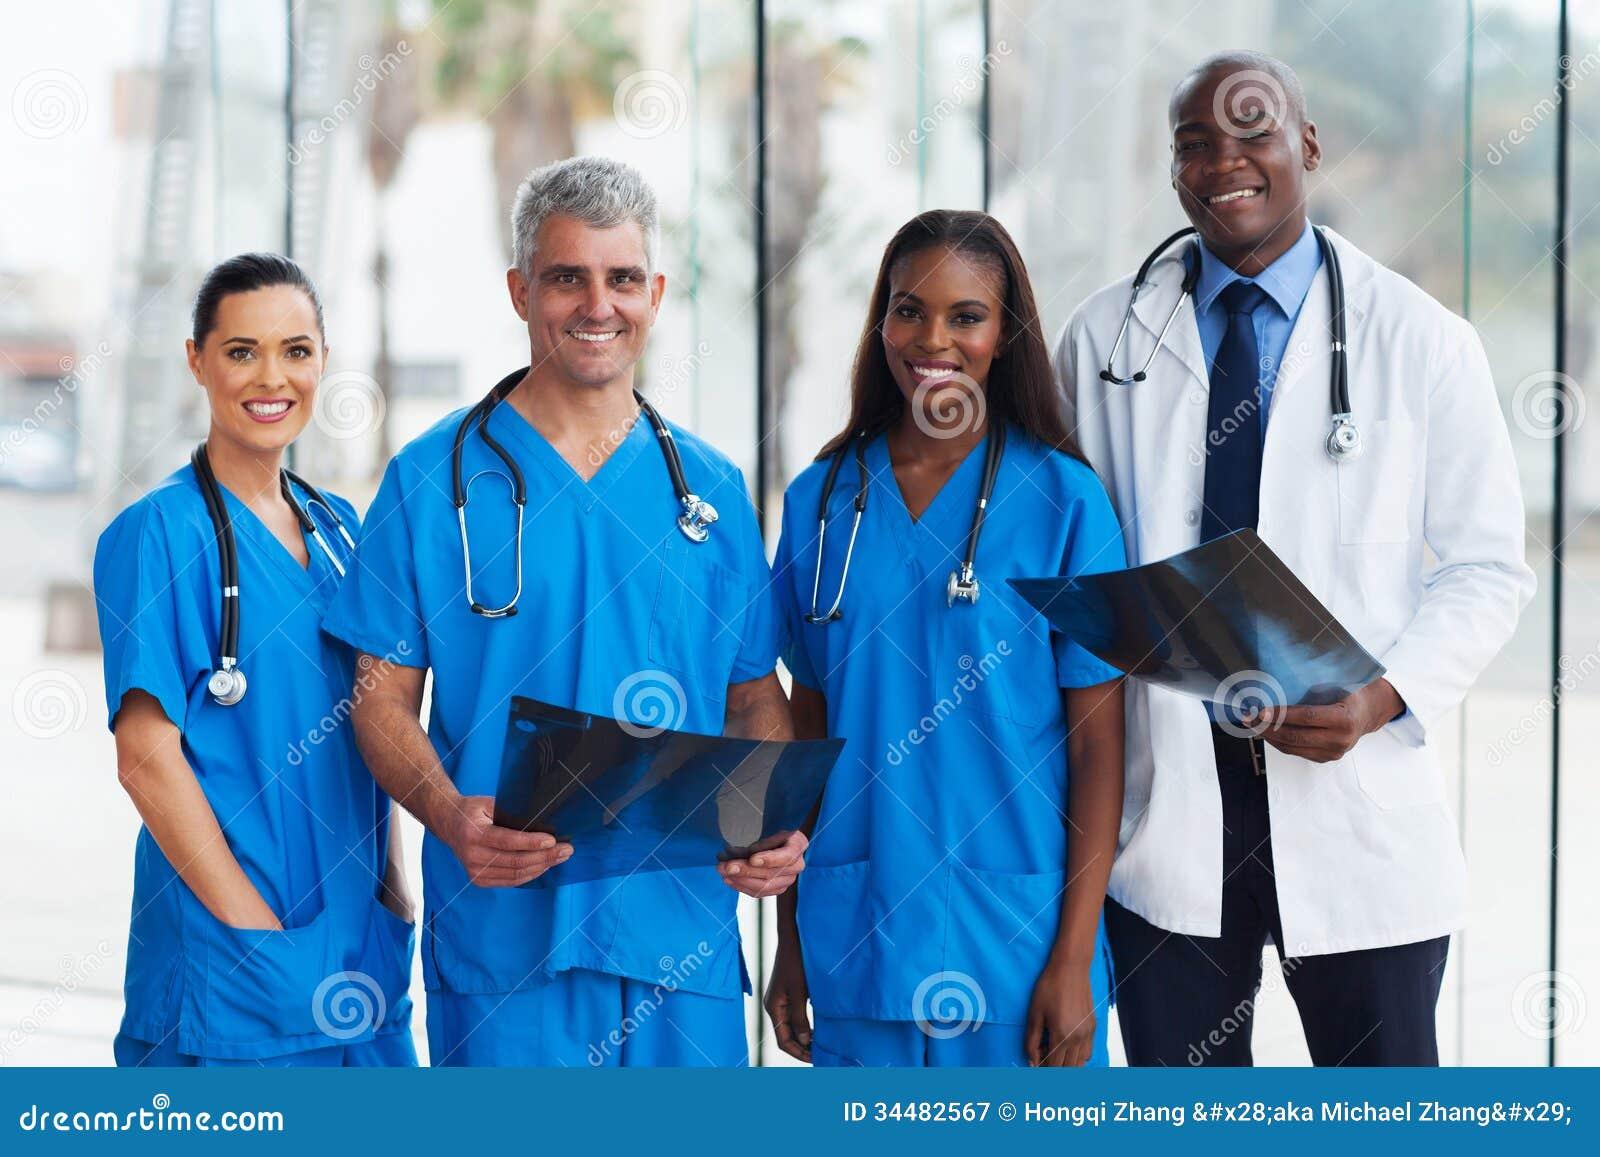 Group medical doctors